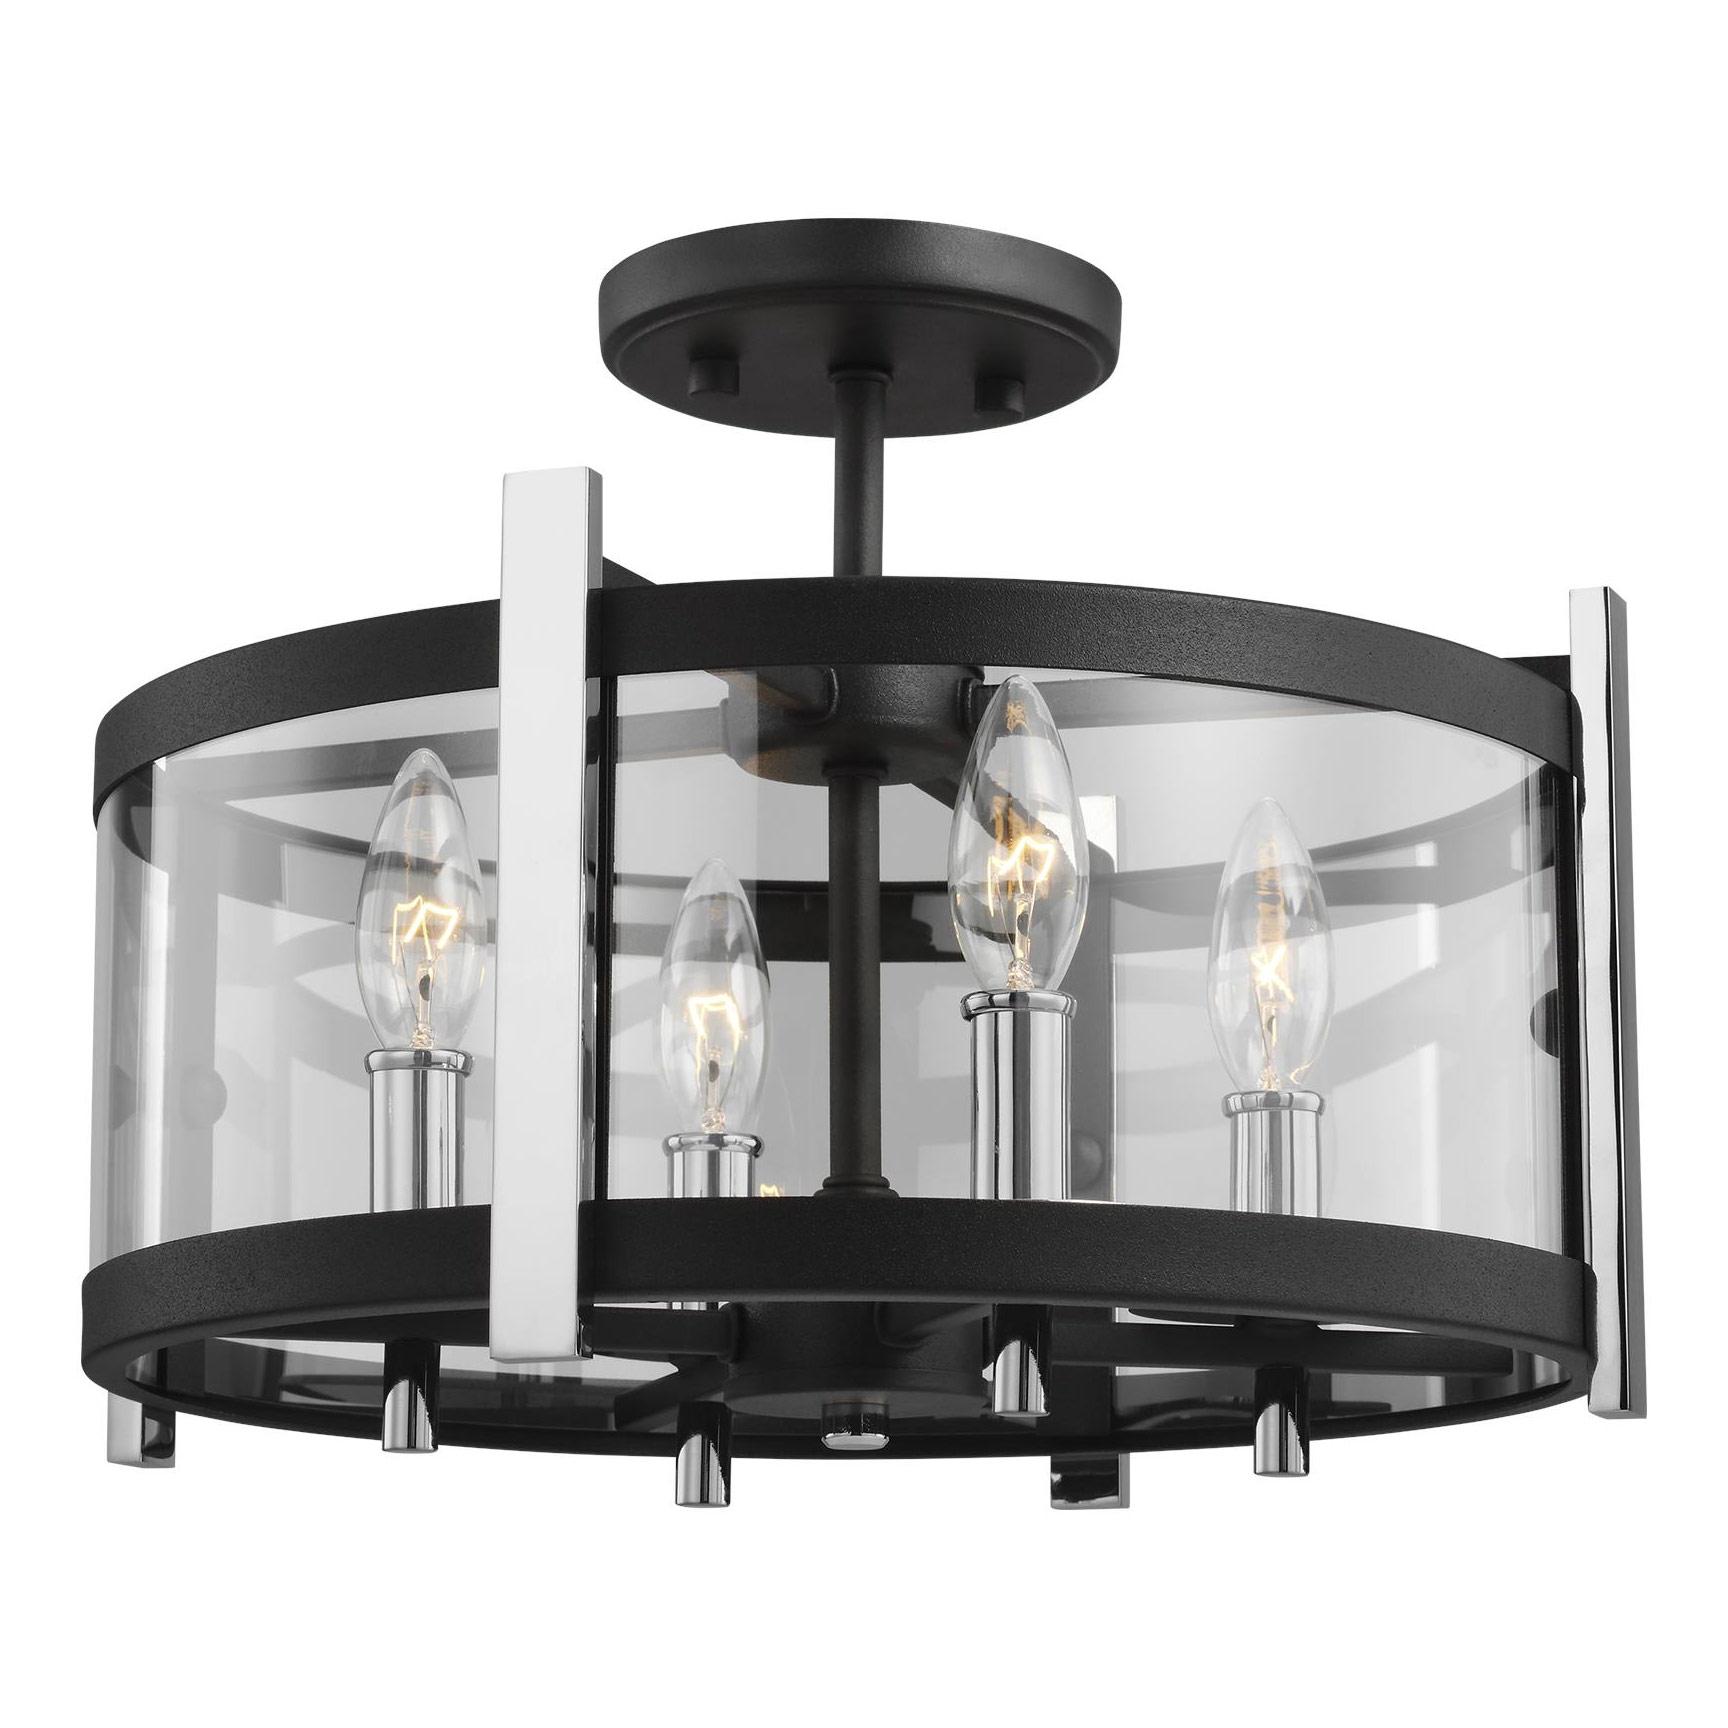 Broderick Semi Flush Ceiling Light Fixture by Feiss   SF347TXB/CH